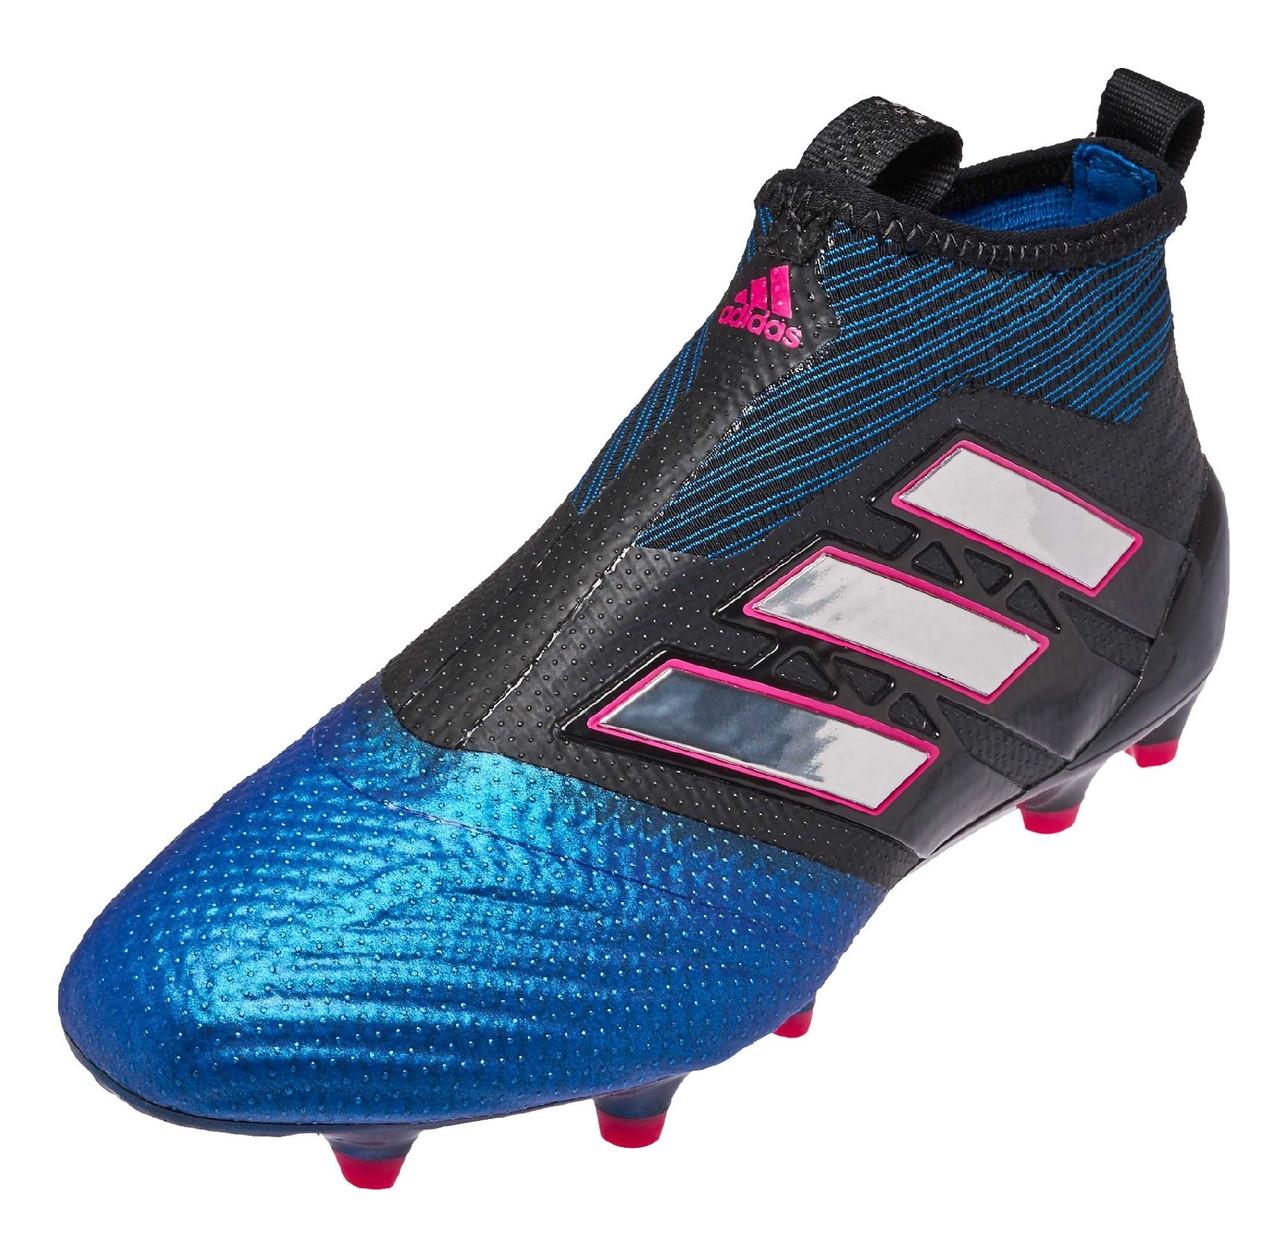 172a4baa70e ... Adidas Ace 17.1 Purecontrol FG Jr - Core Black Cloud White Blue  (121518. Sale